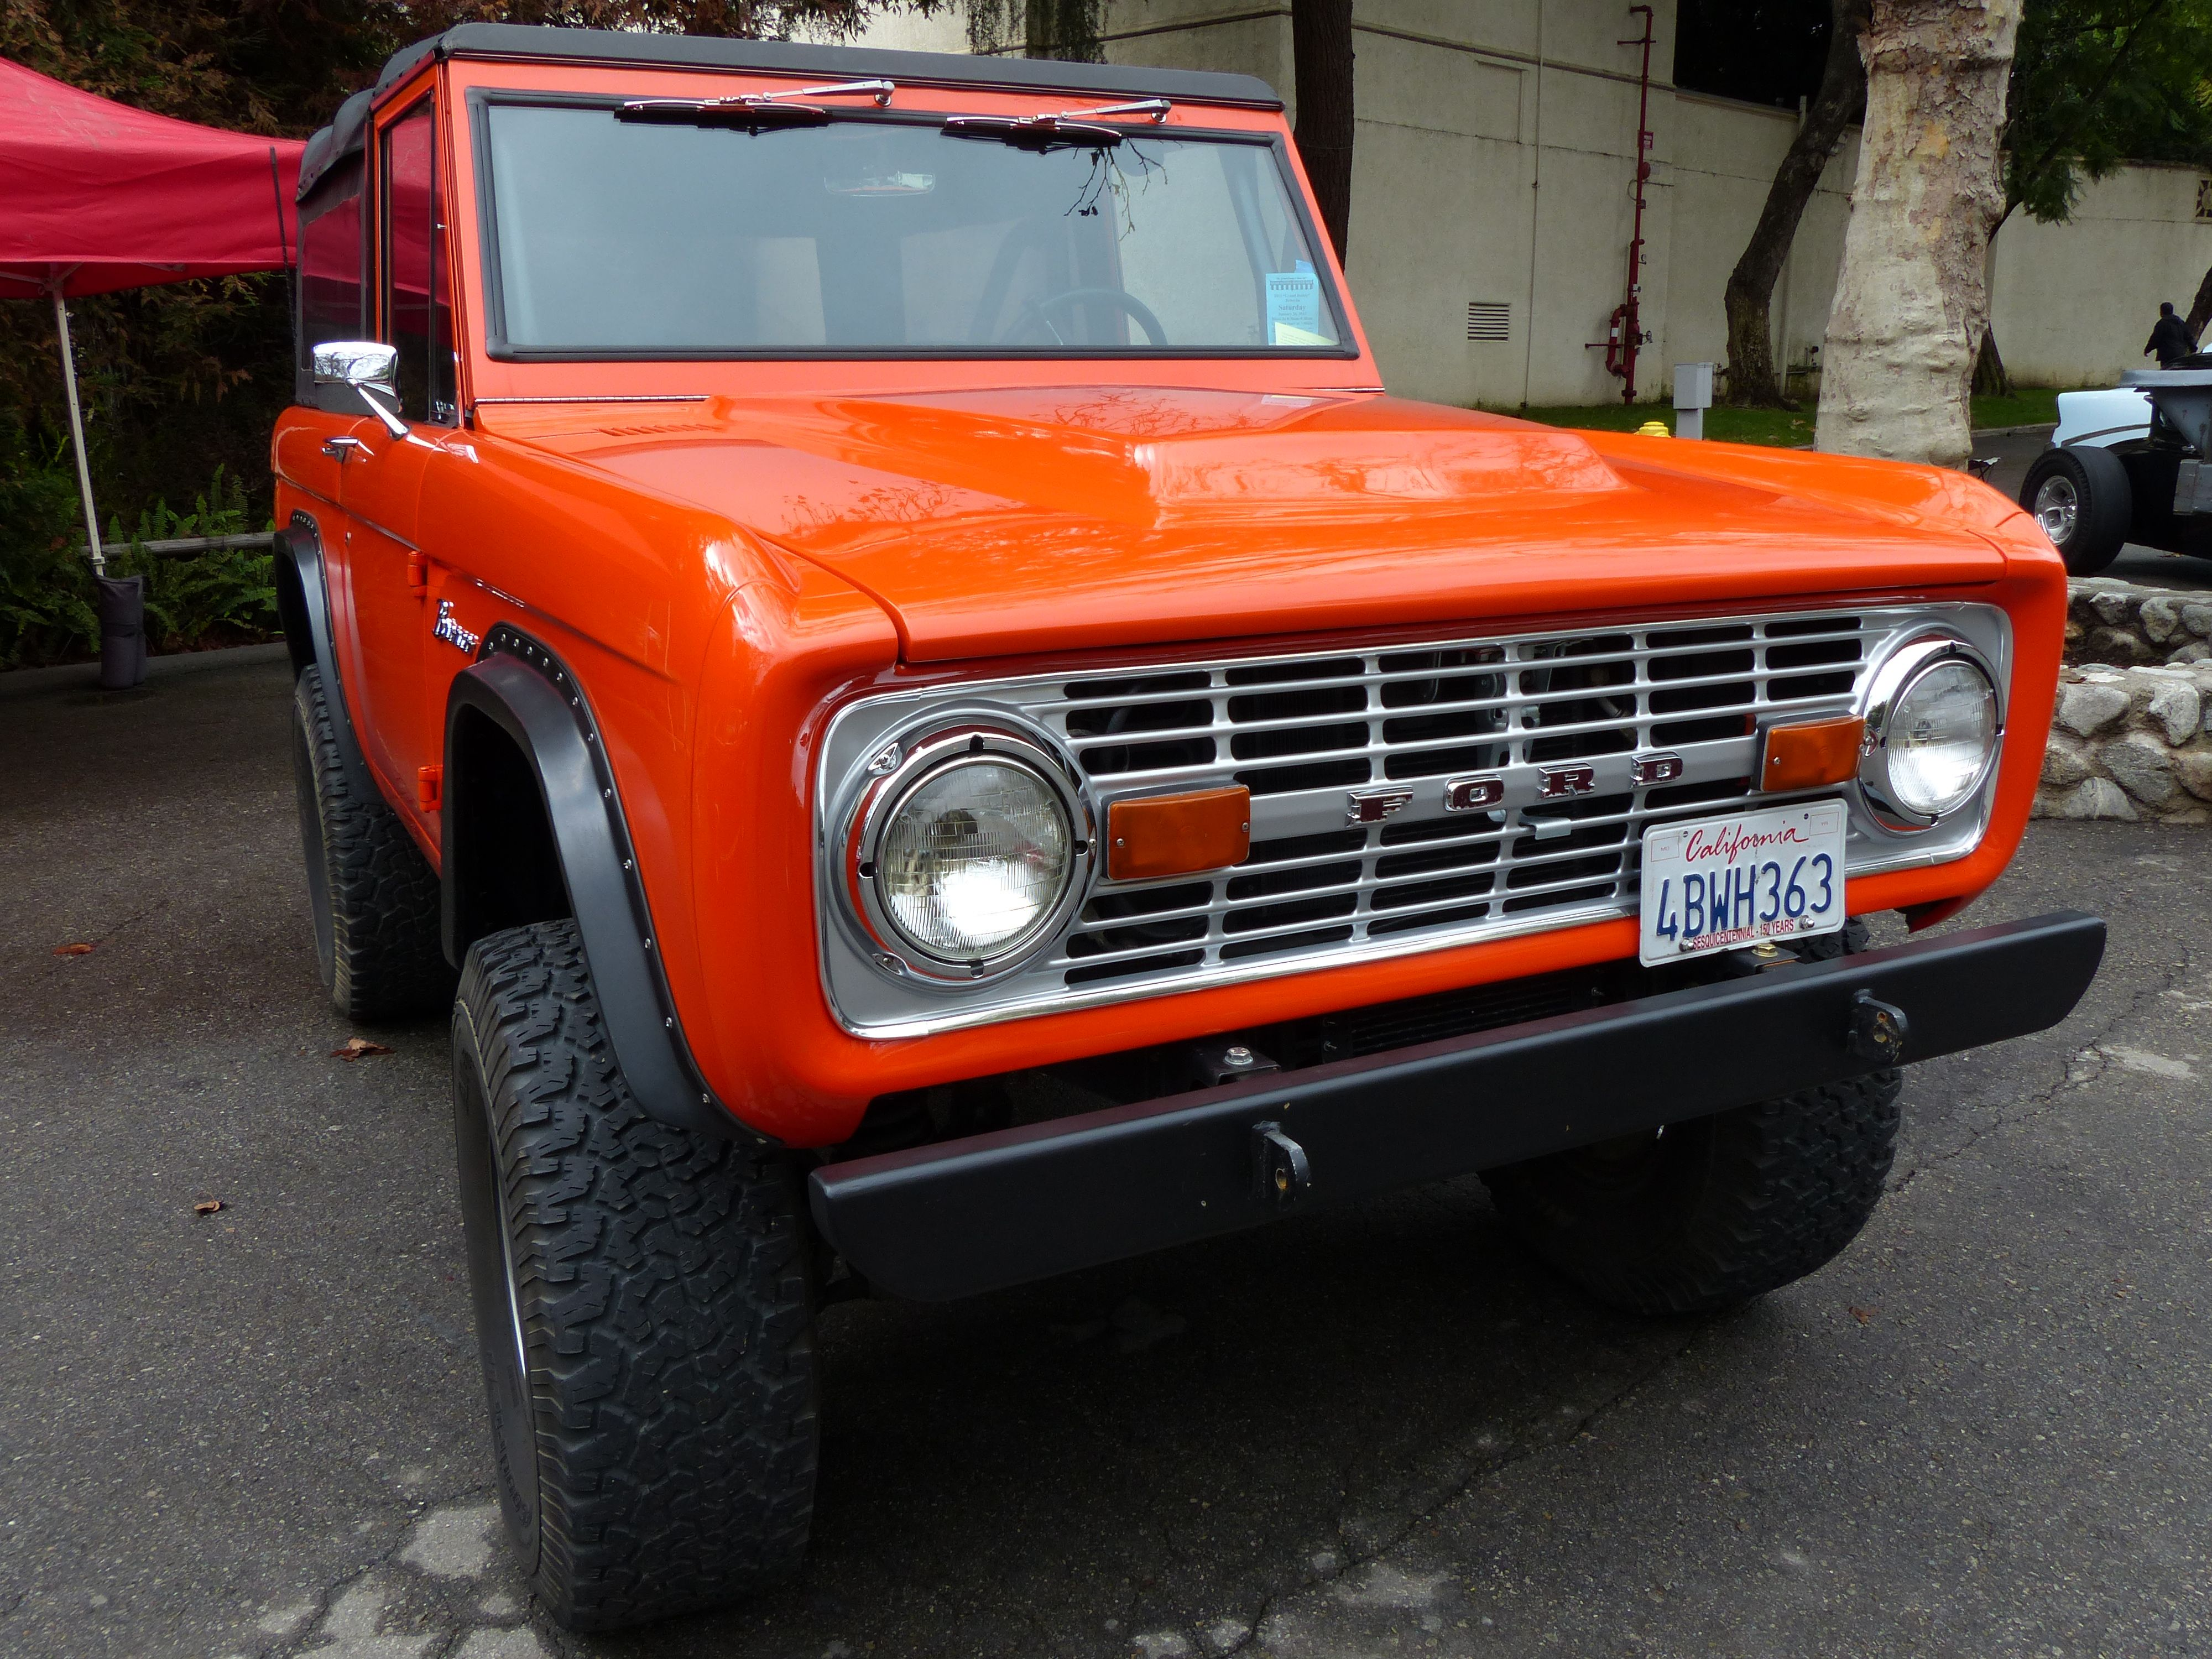 Ford Bronco SUV Sports Utility Vintage trucks, Ford